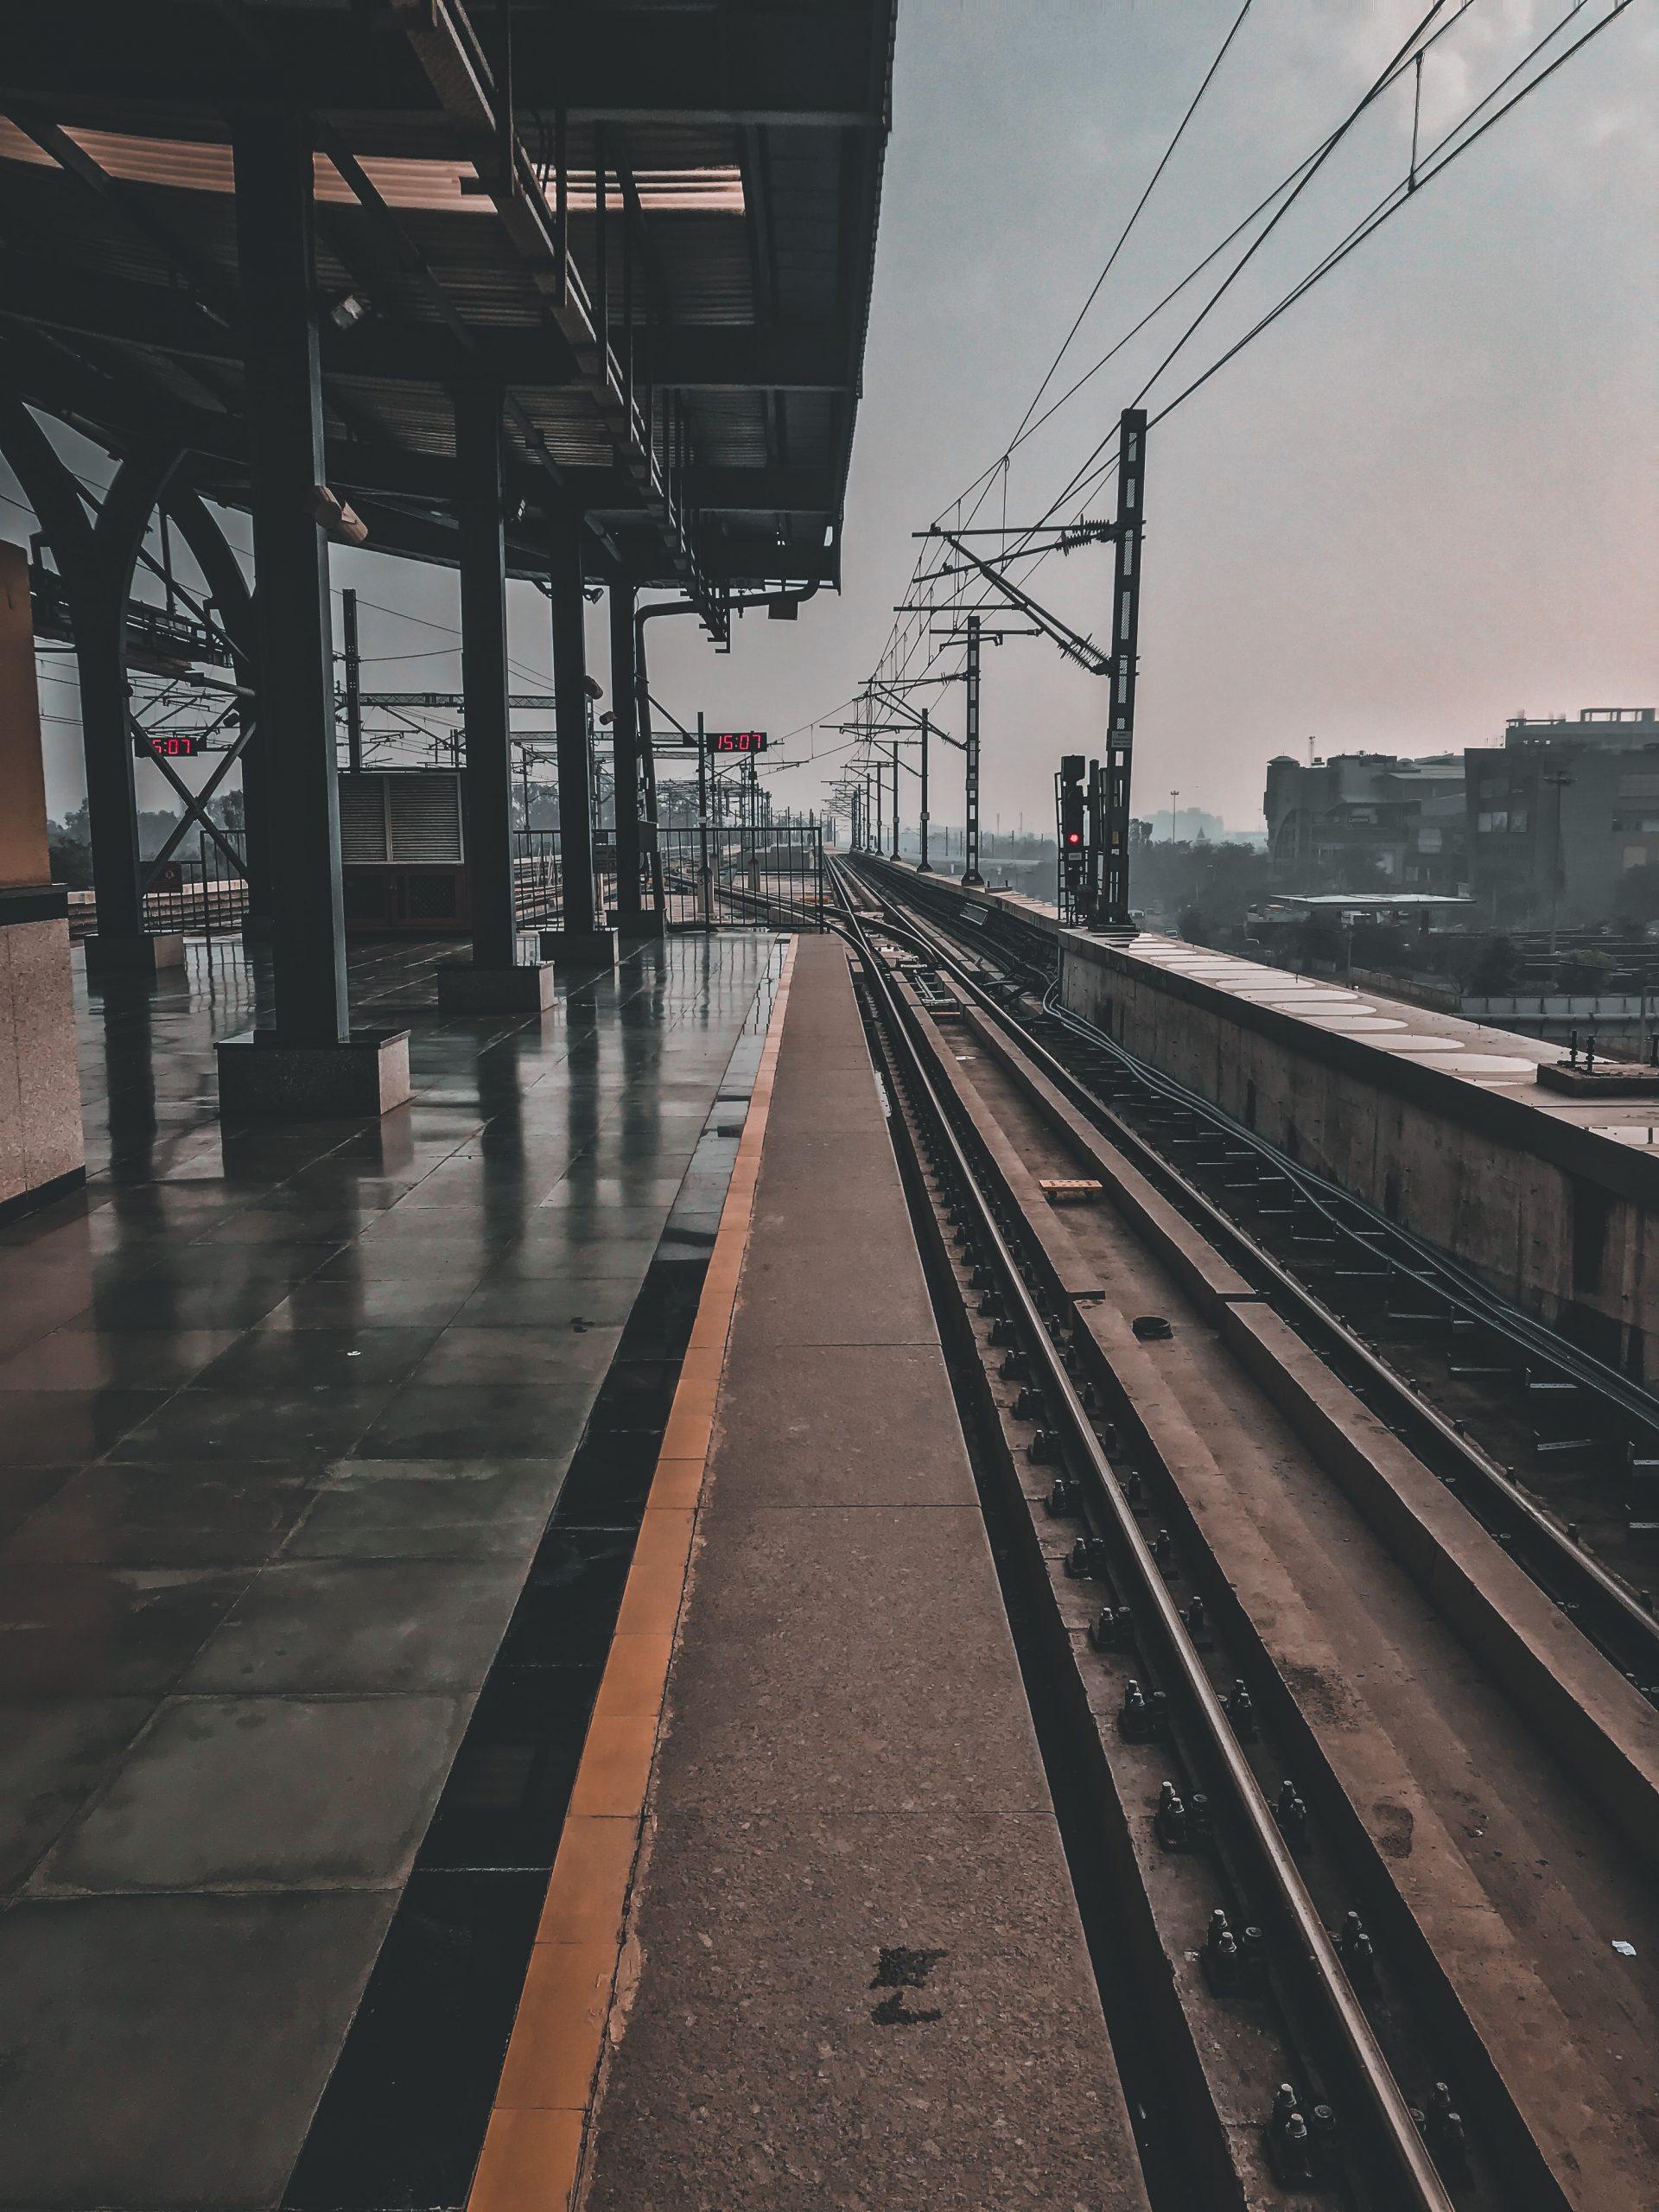 Empty train tracks